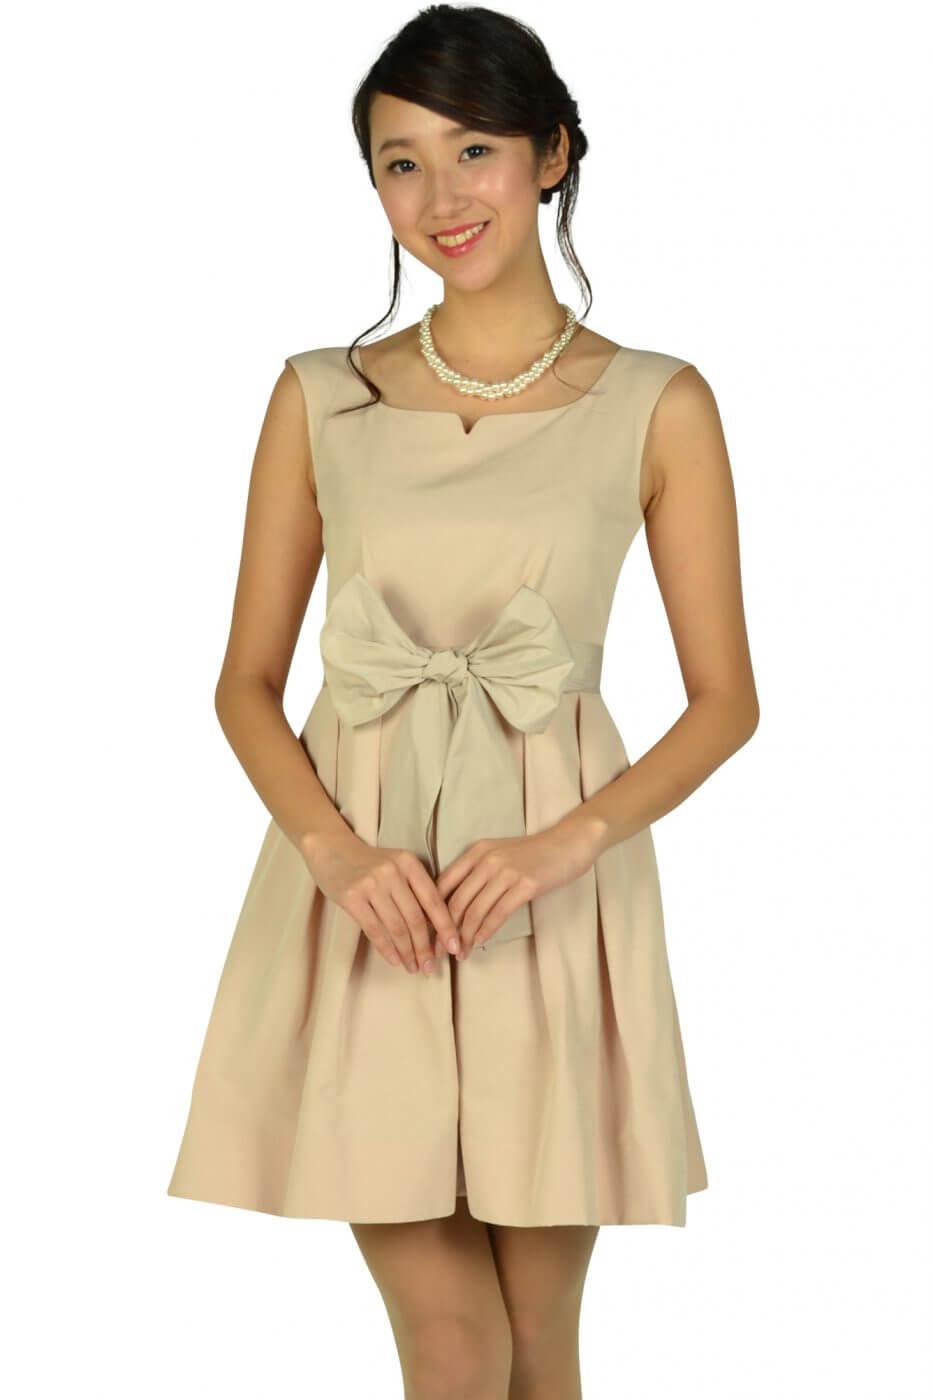 04259cf0139ea ジルスチュアート(JILLSTUART)ハートシェイプドネックピンクドレス